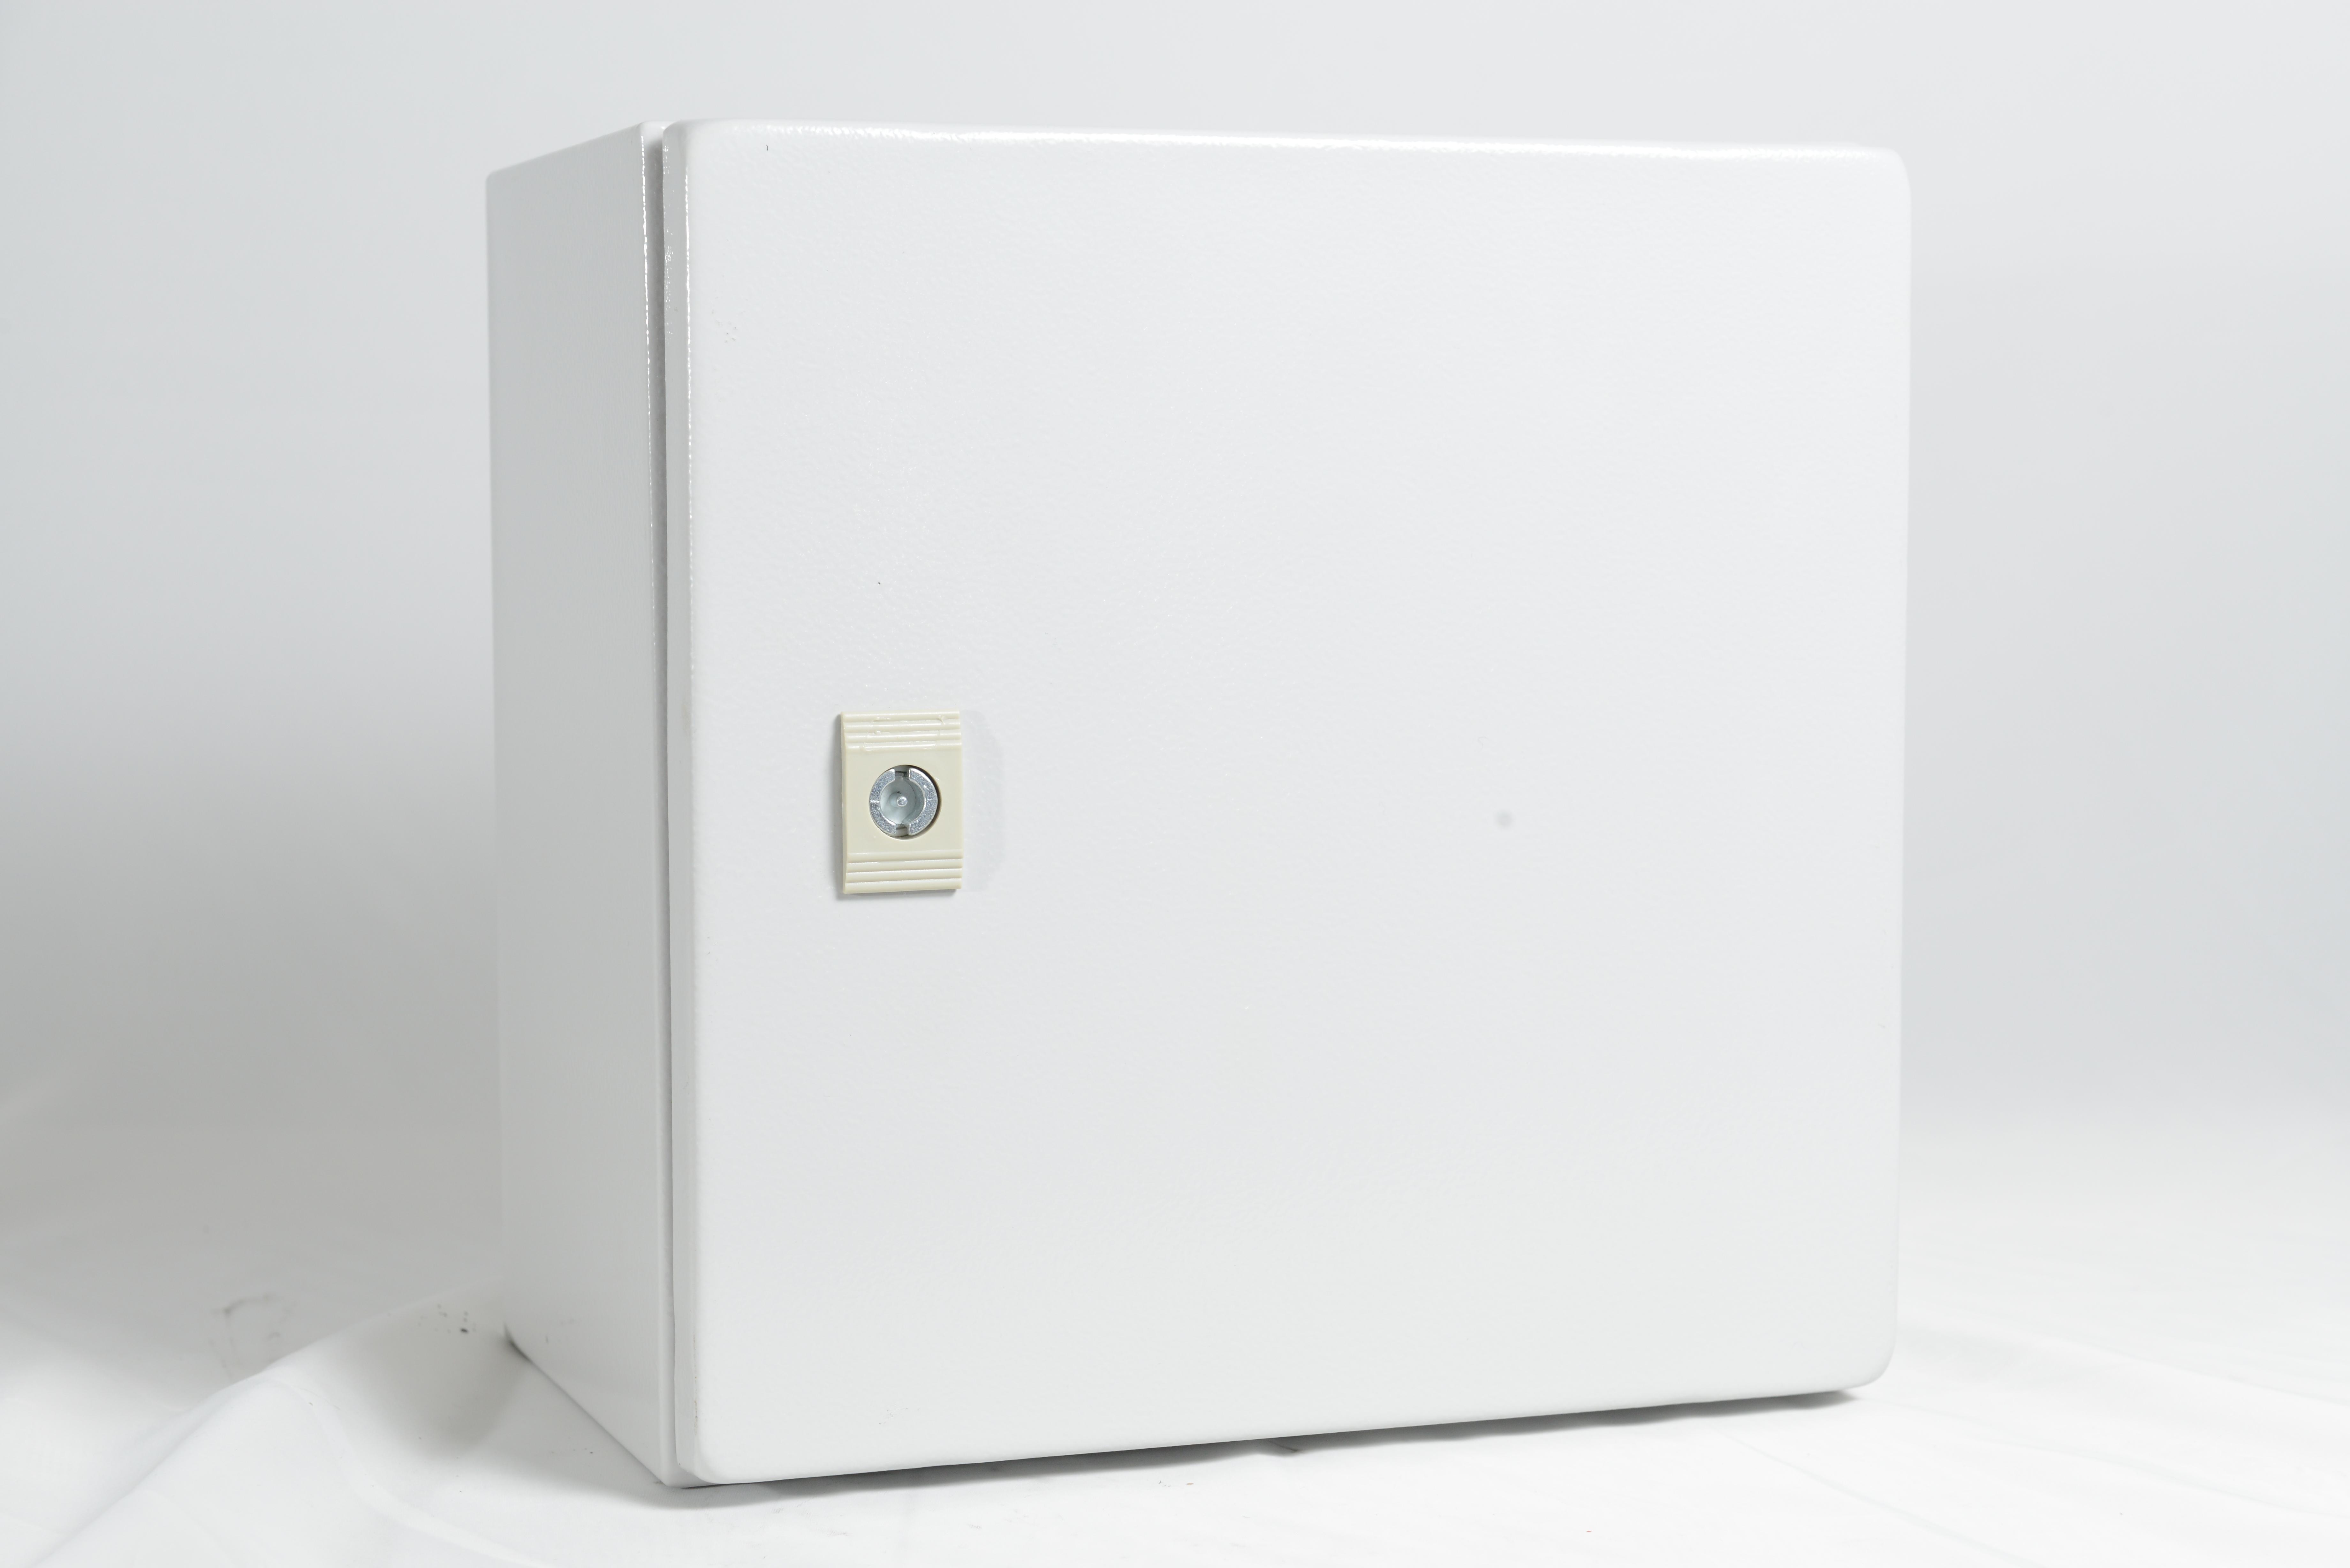 RCG Metal Enclosure 800x800x300mm - Wall mounting